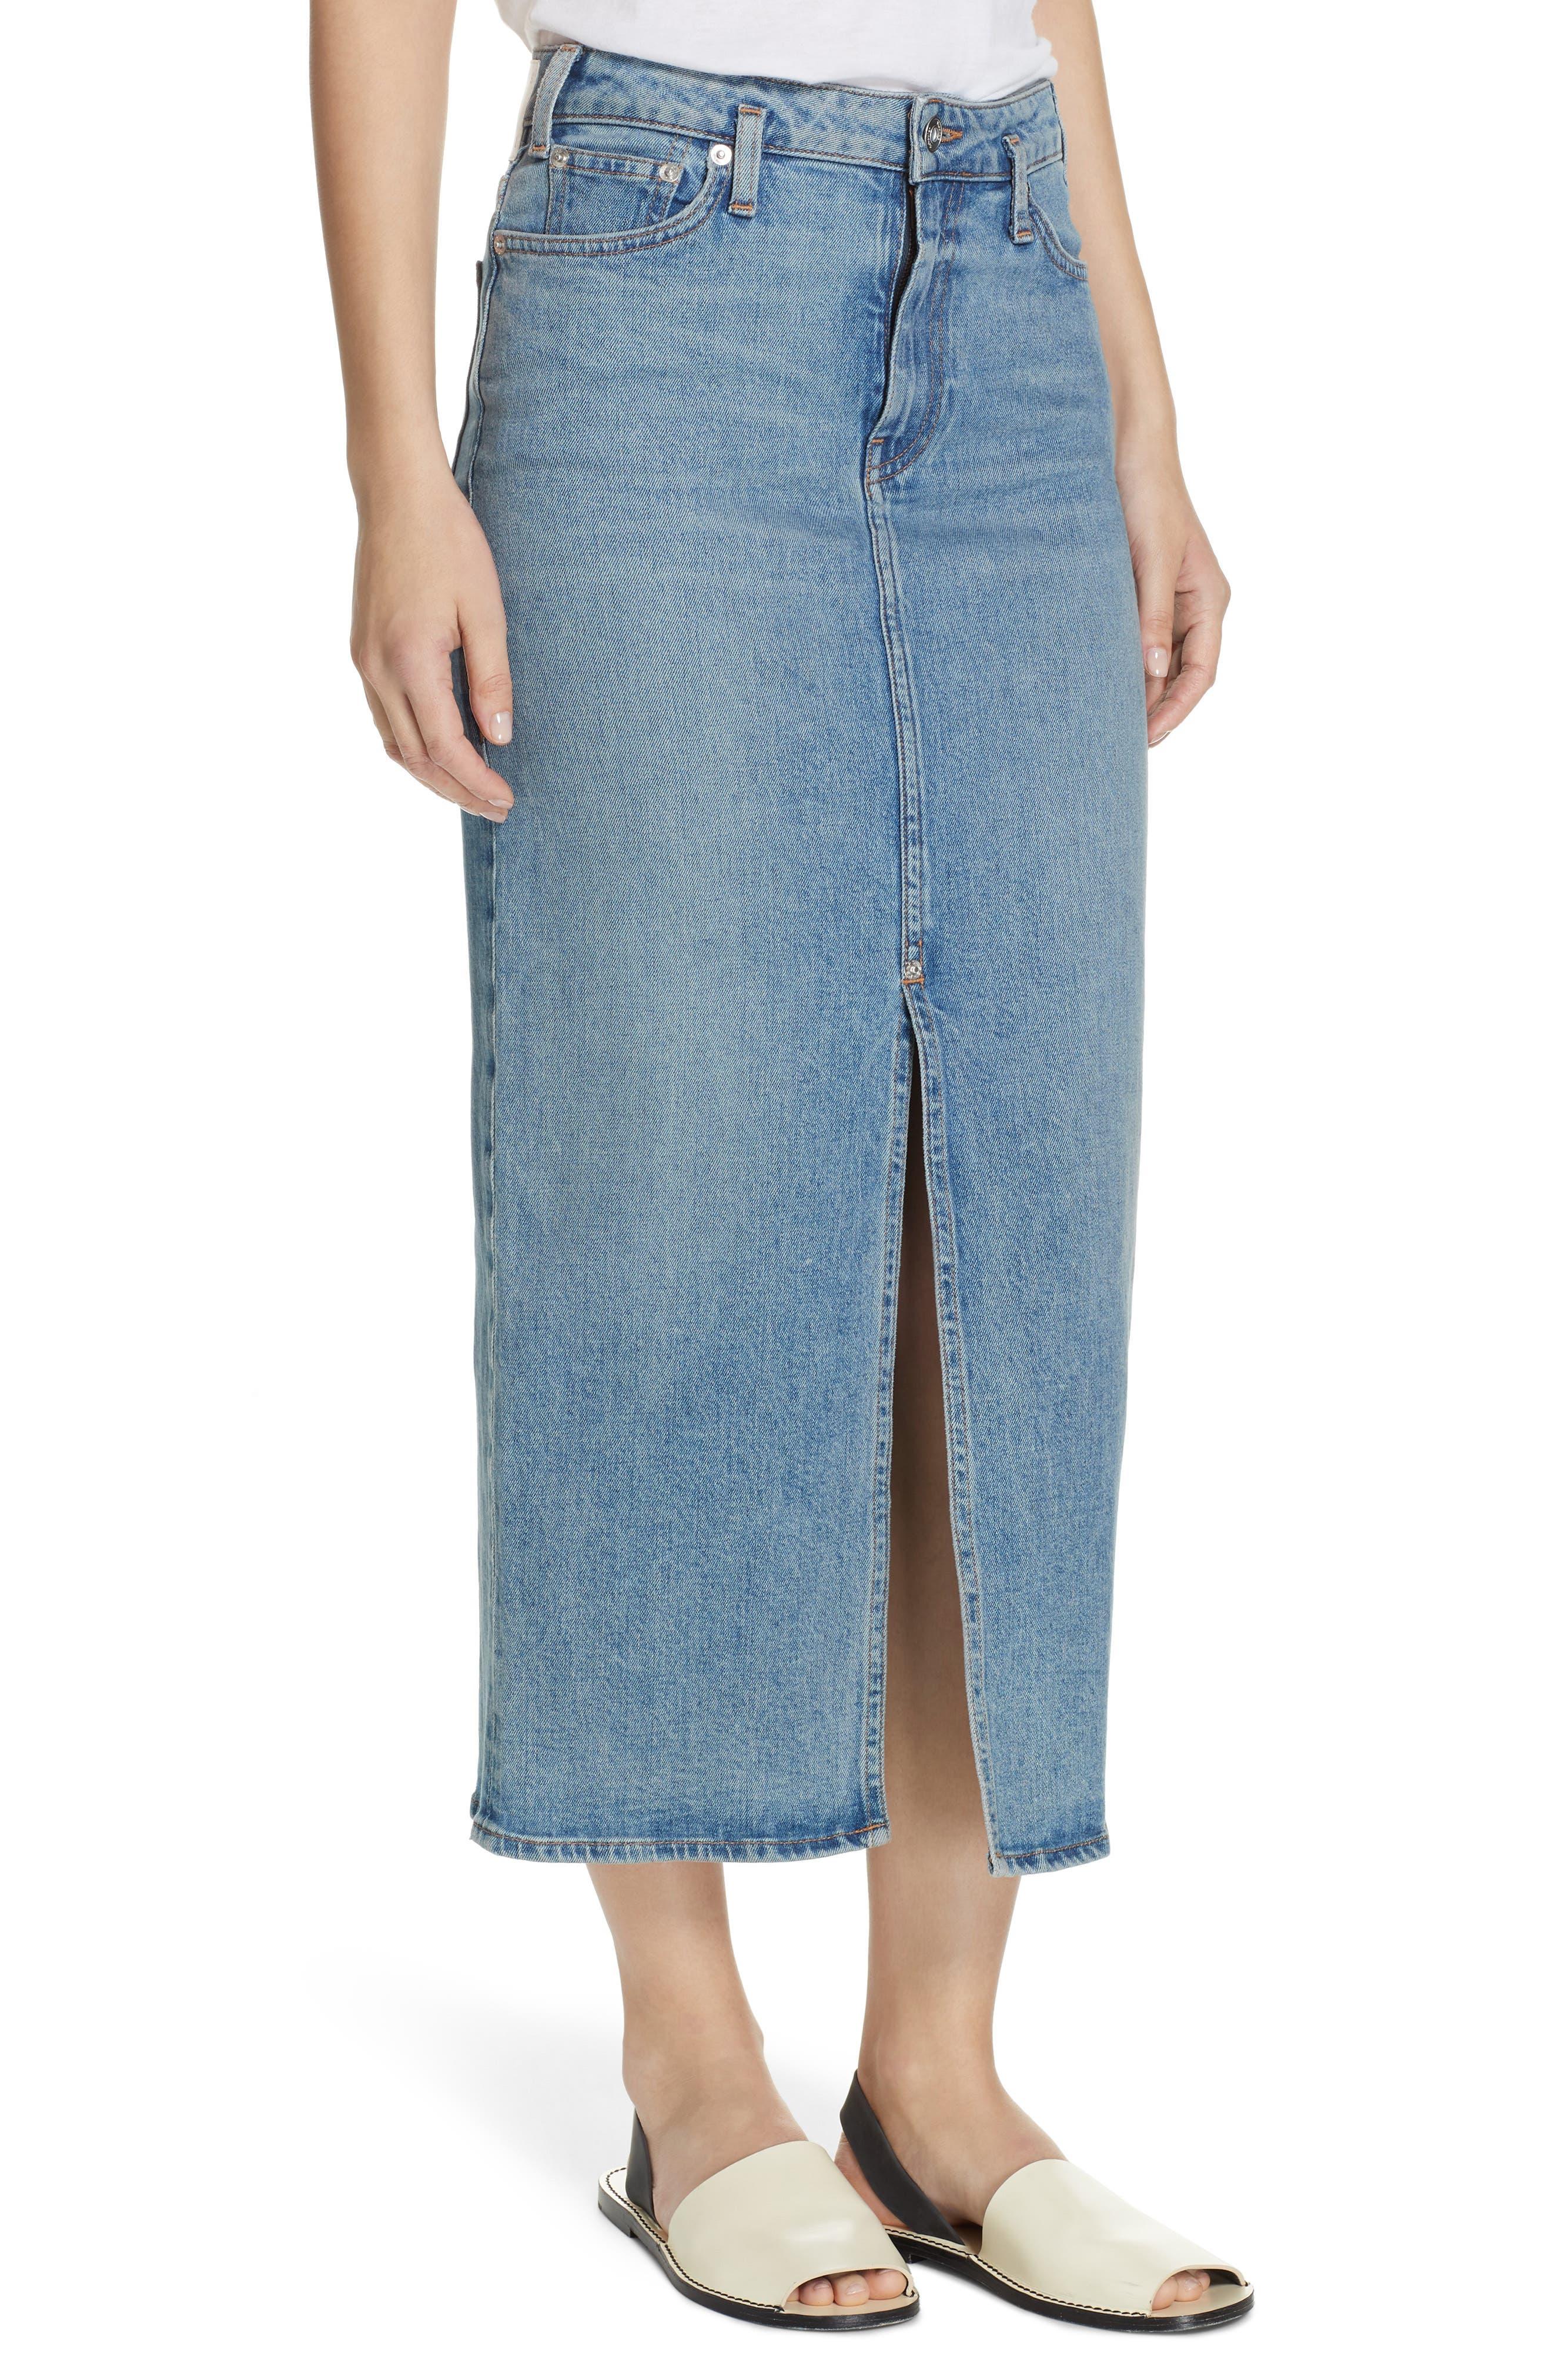 PROENZA SCHOULER, Slit Seam Denim Midi Skirt, Alternate thumbnail 4, color, CALIFORNIA